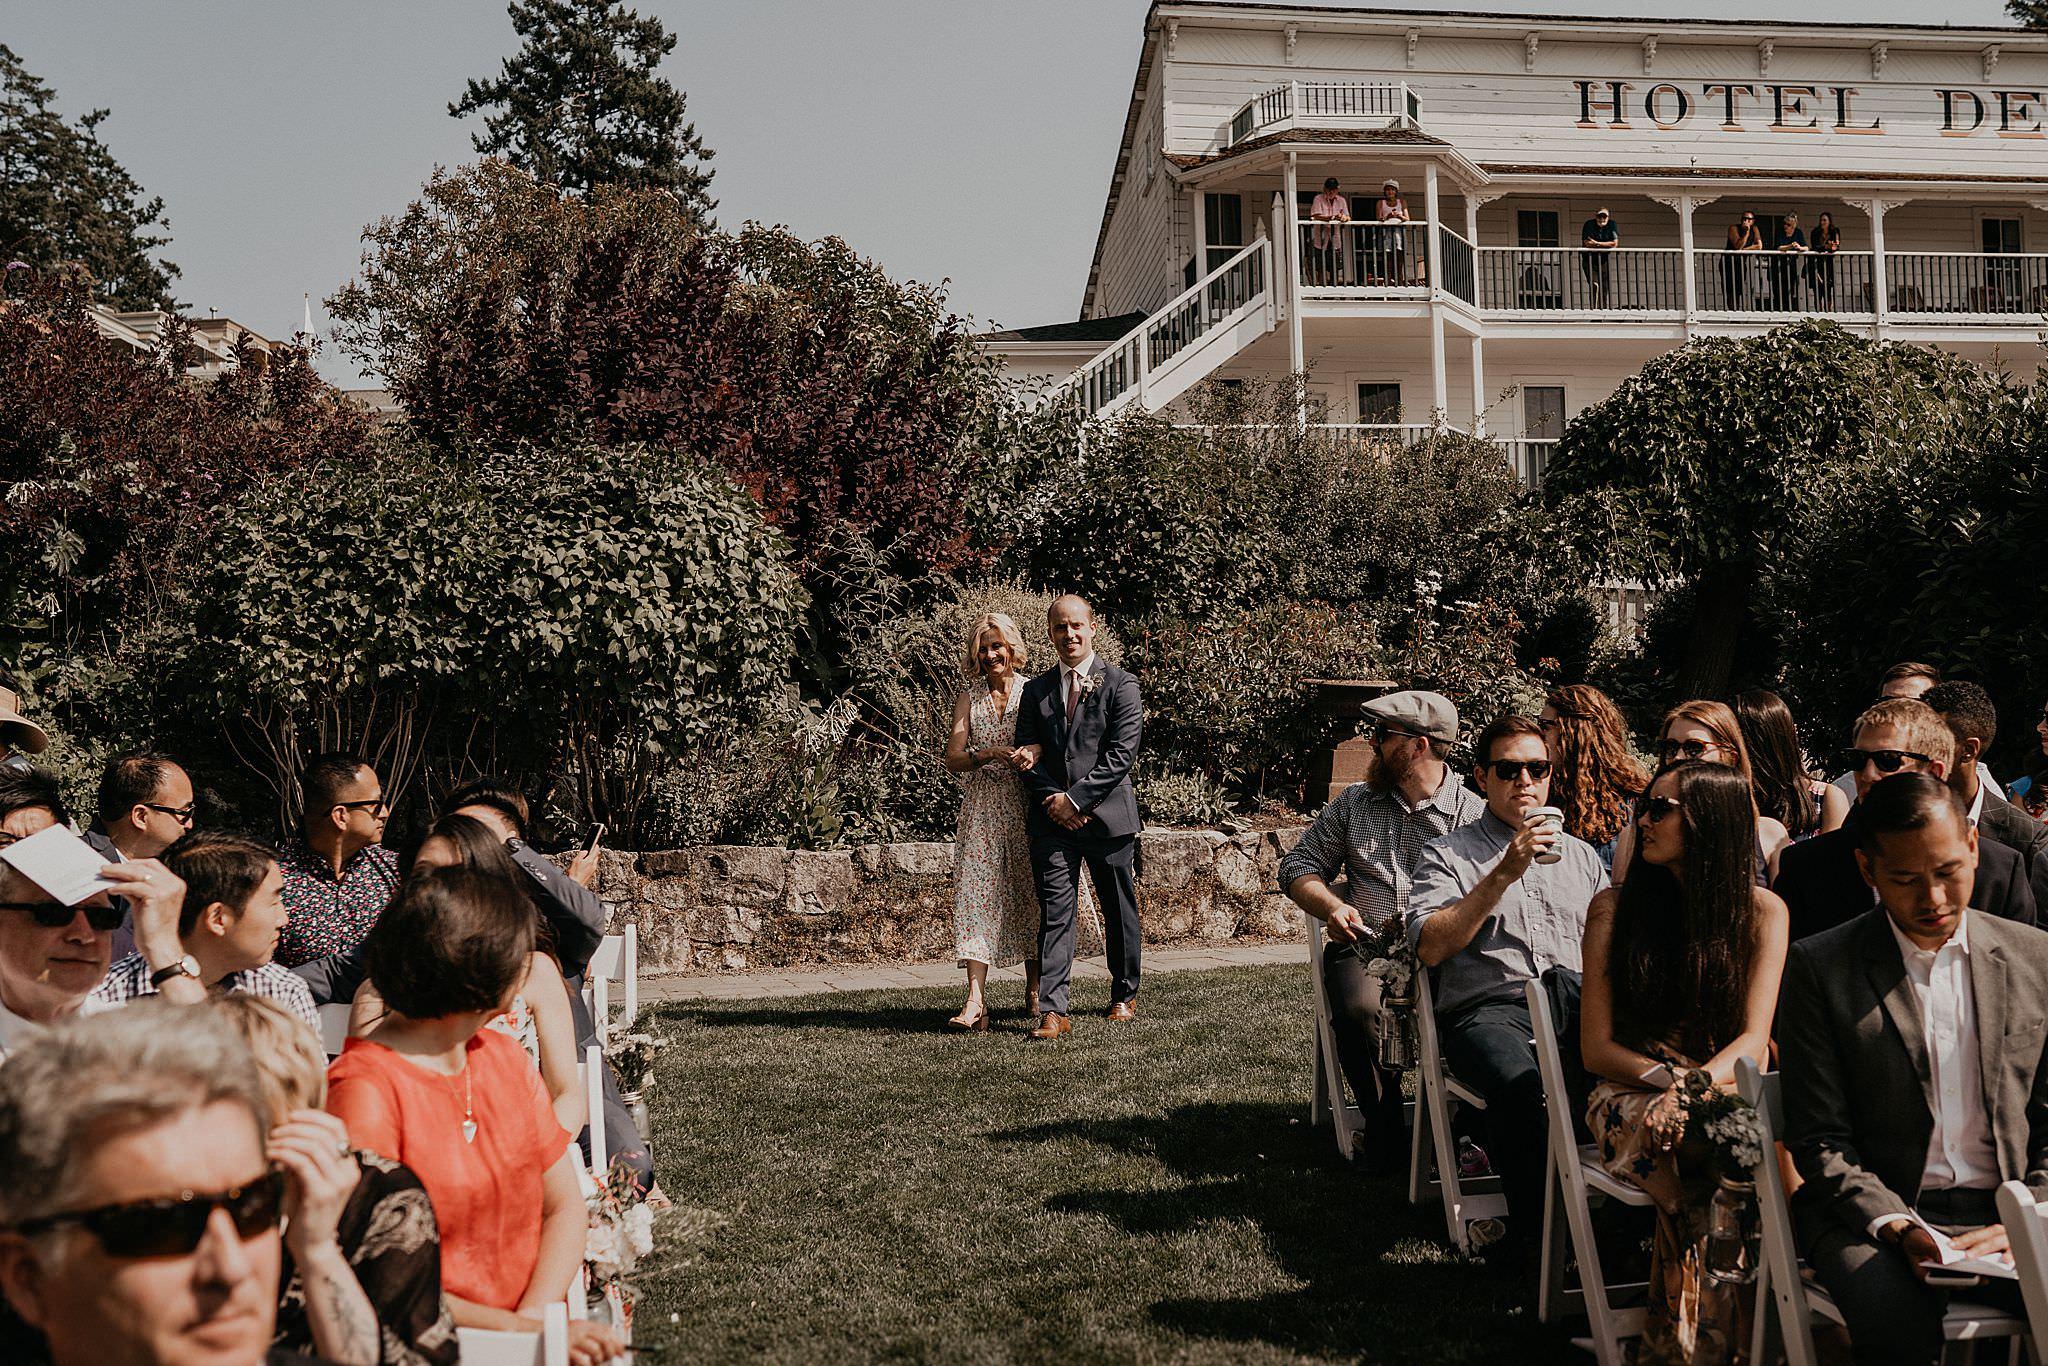 roche-harbor-wedding-san-juans-island-washington_0055.jpg